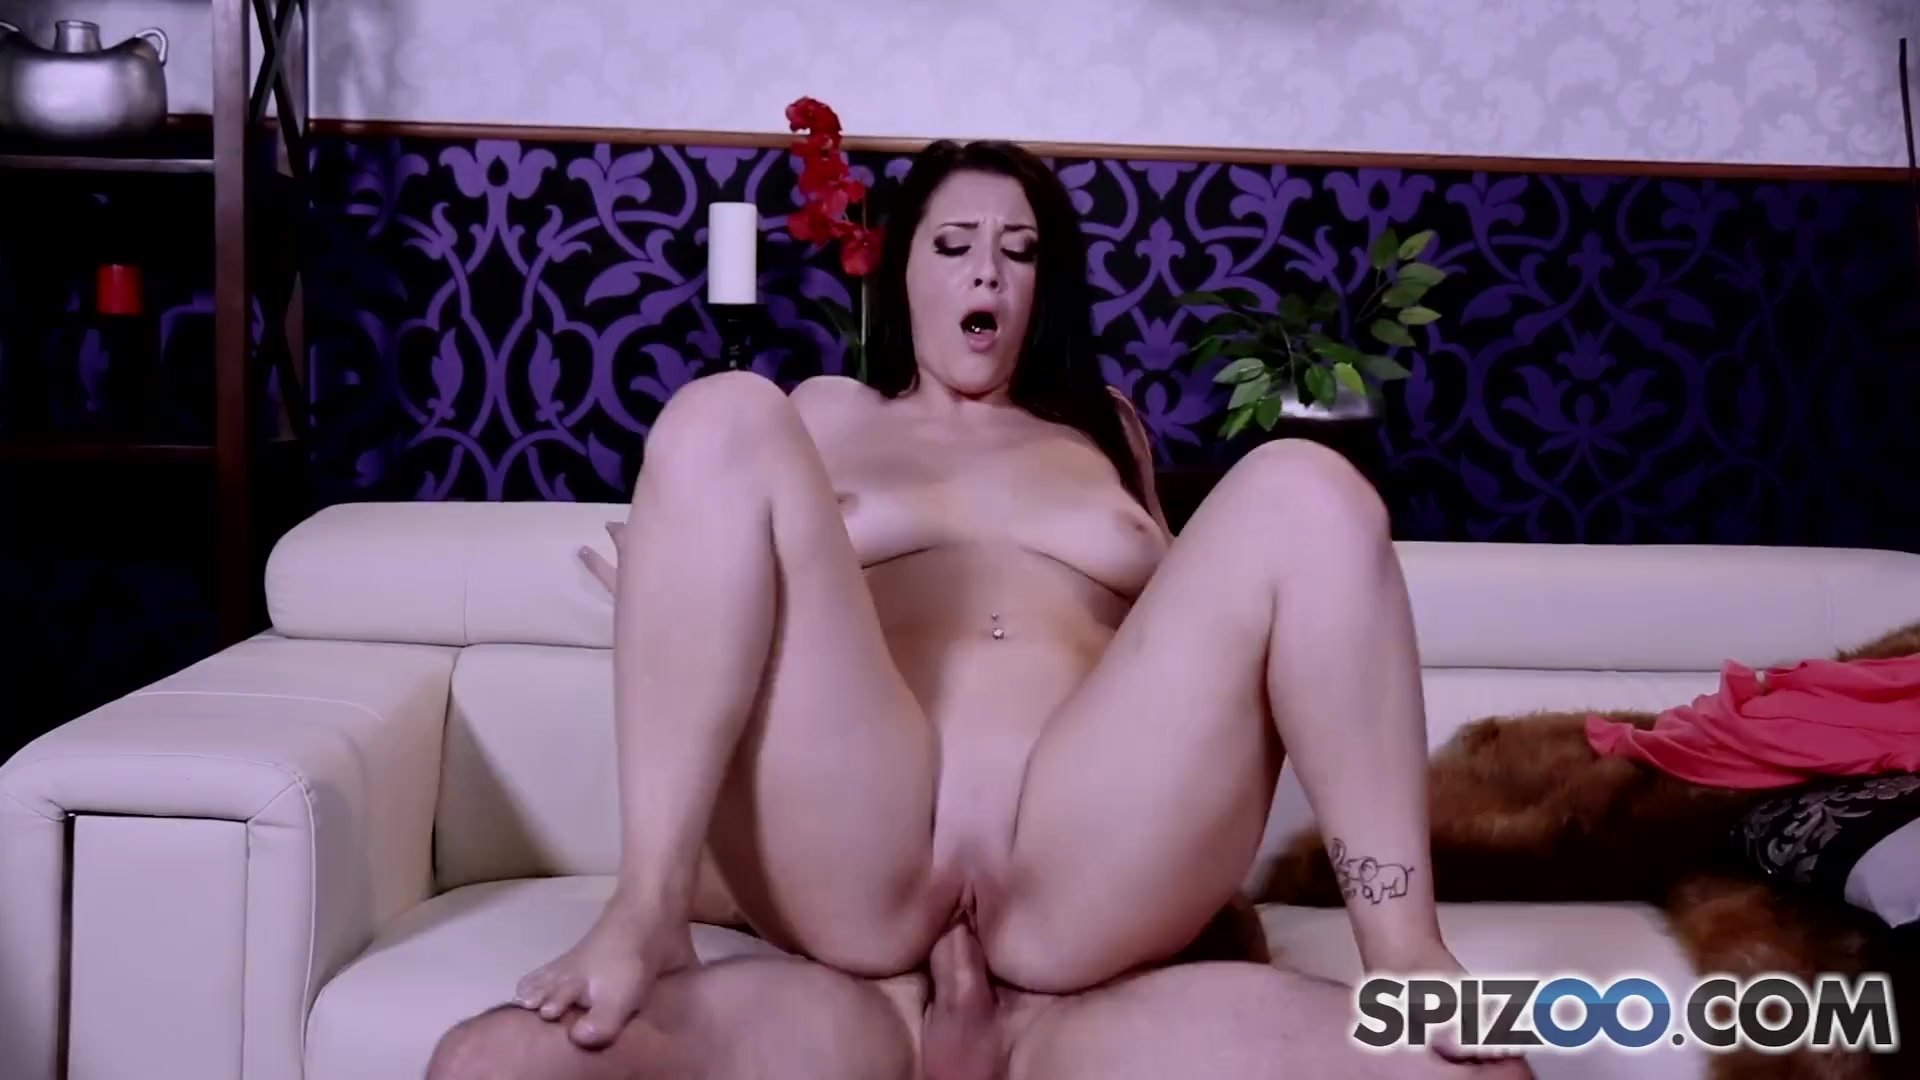 Spizoo - Big booty Noelle Easton is fucked by a big hard dick, big boobs